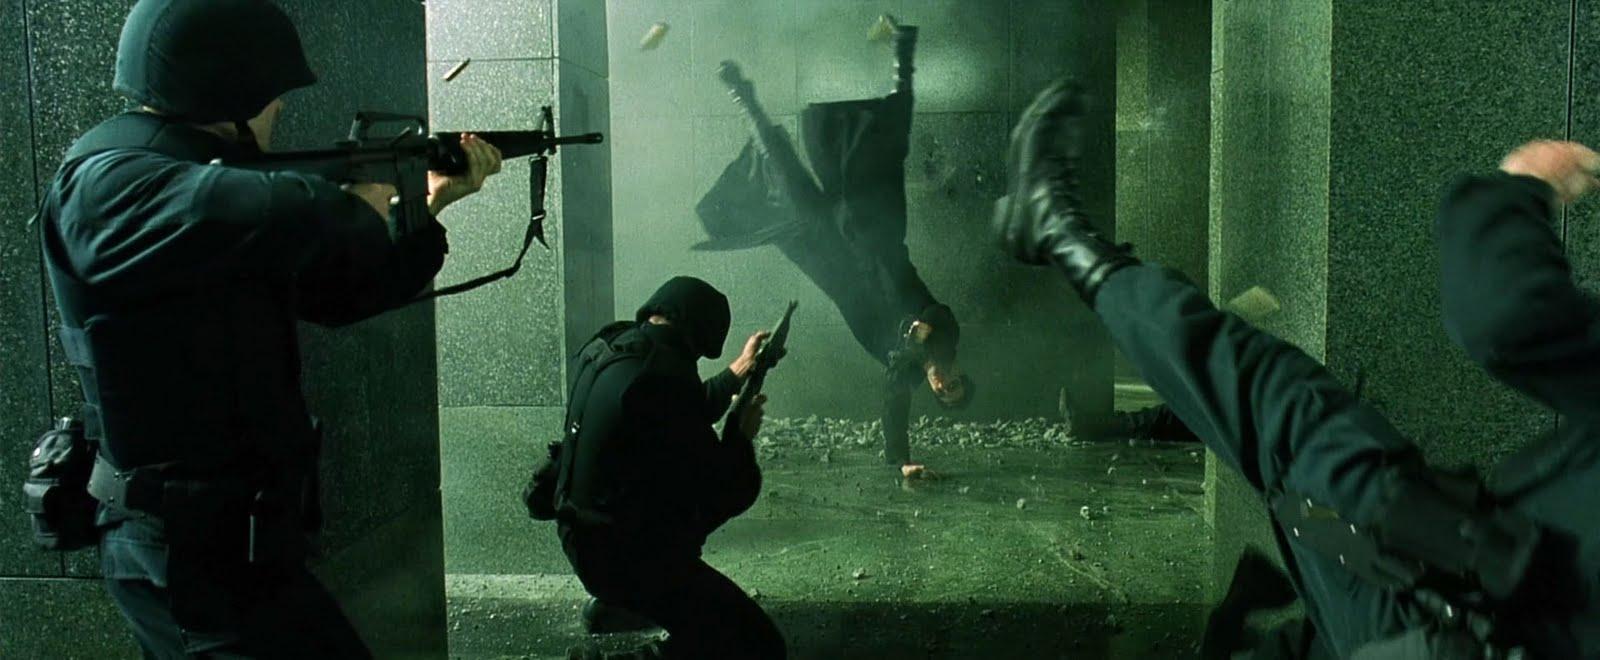 Matrix-scene